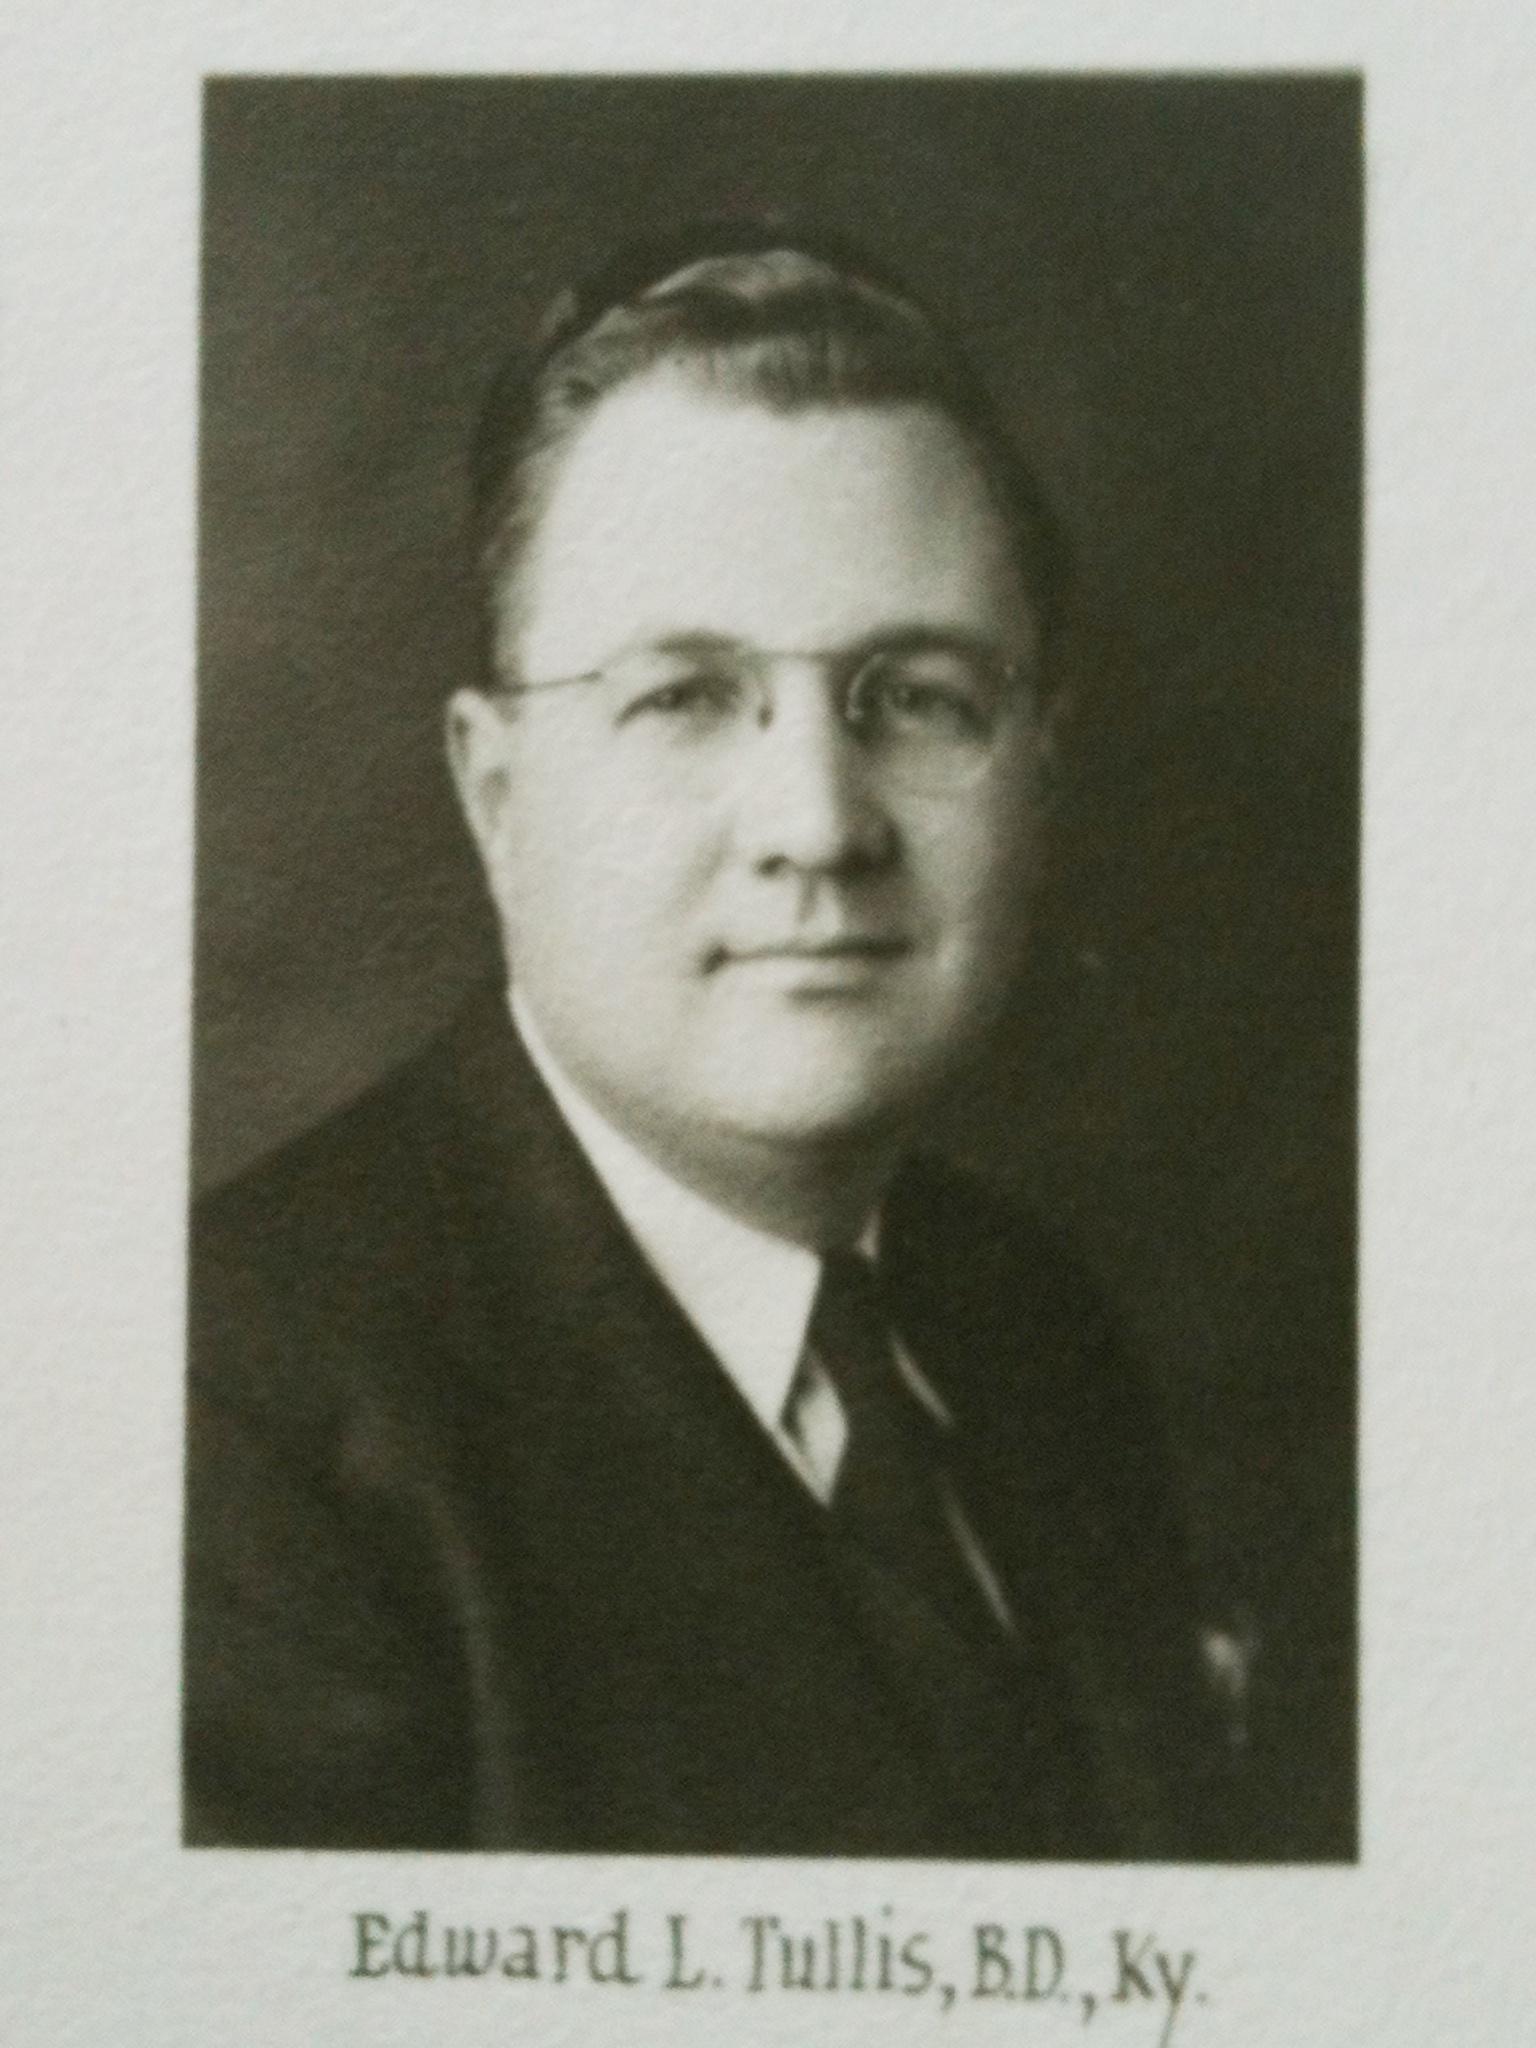 Edward Lewis Tullis